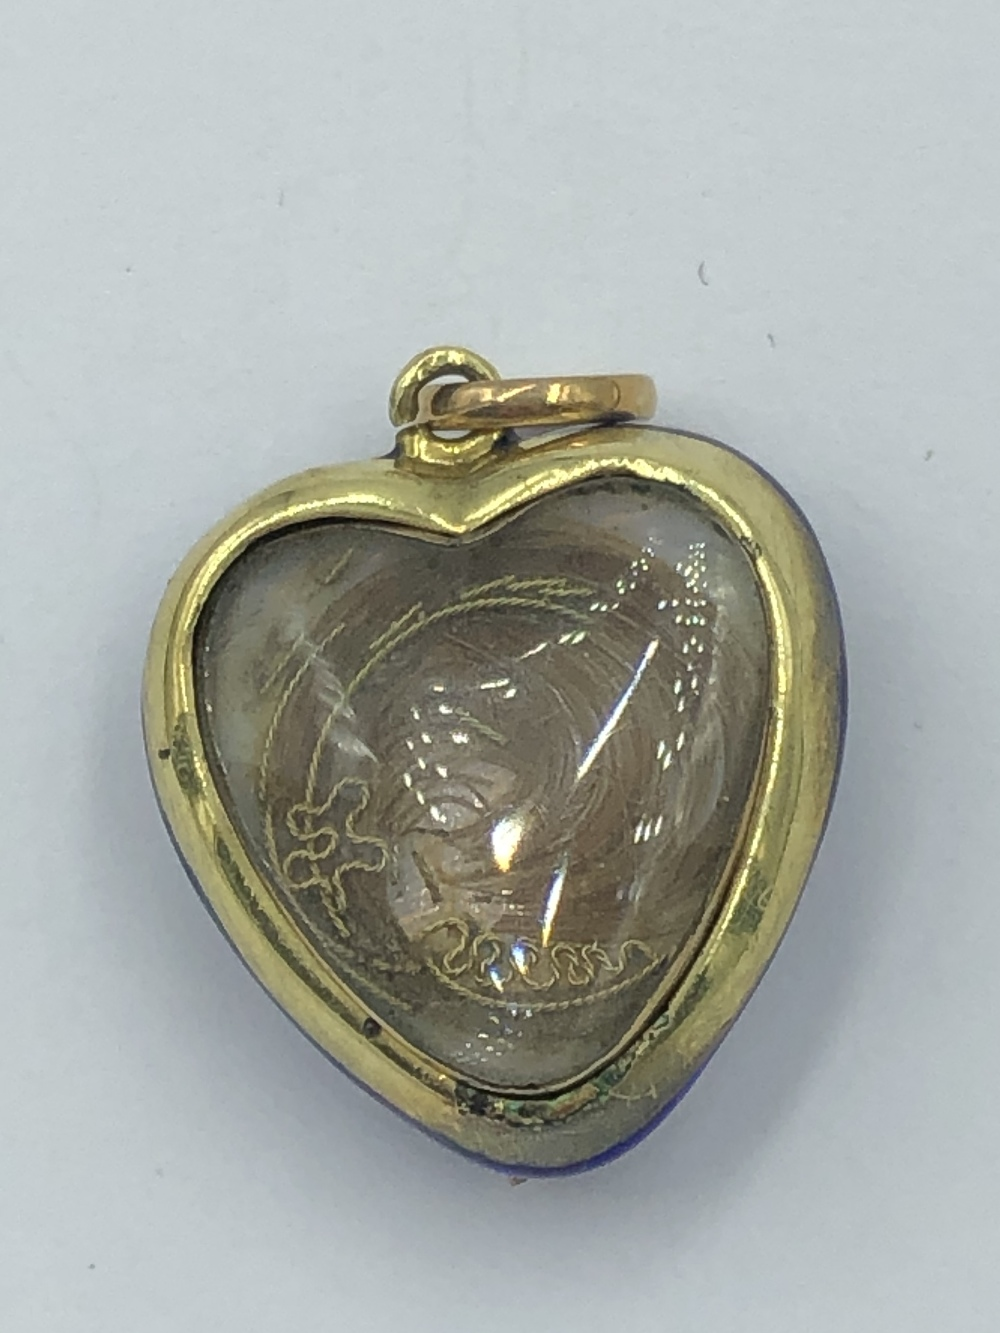 Lot 19 - NO ONLINE BIDDING LOTS 1-30. Heart shaped mourning pendant, blue guilloche enamel front set